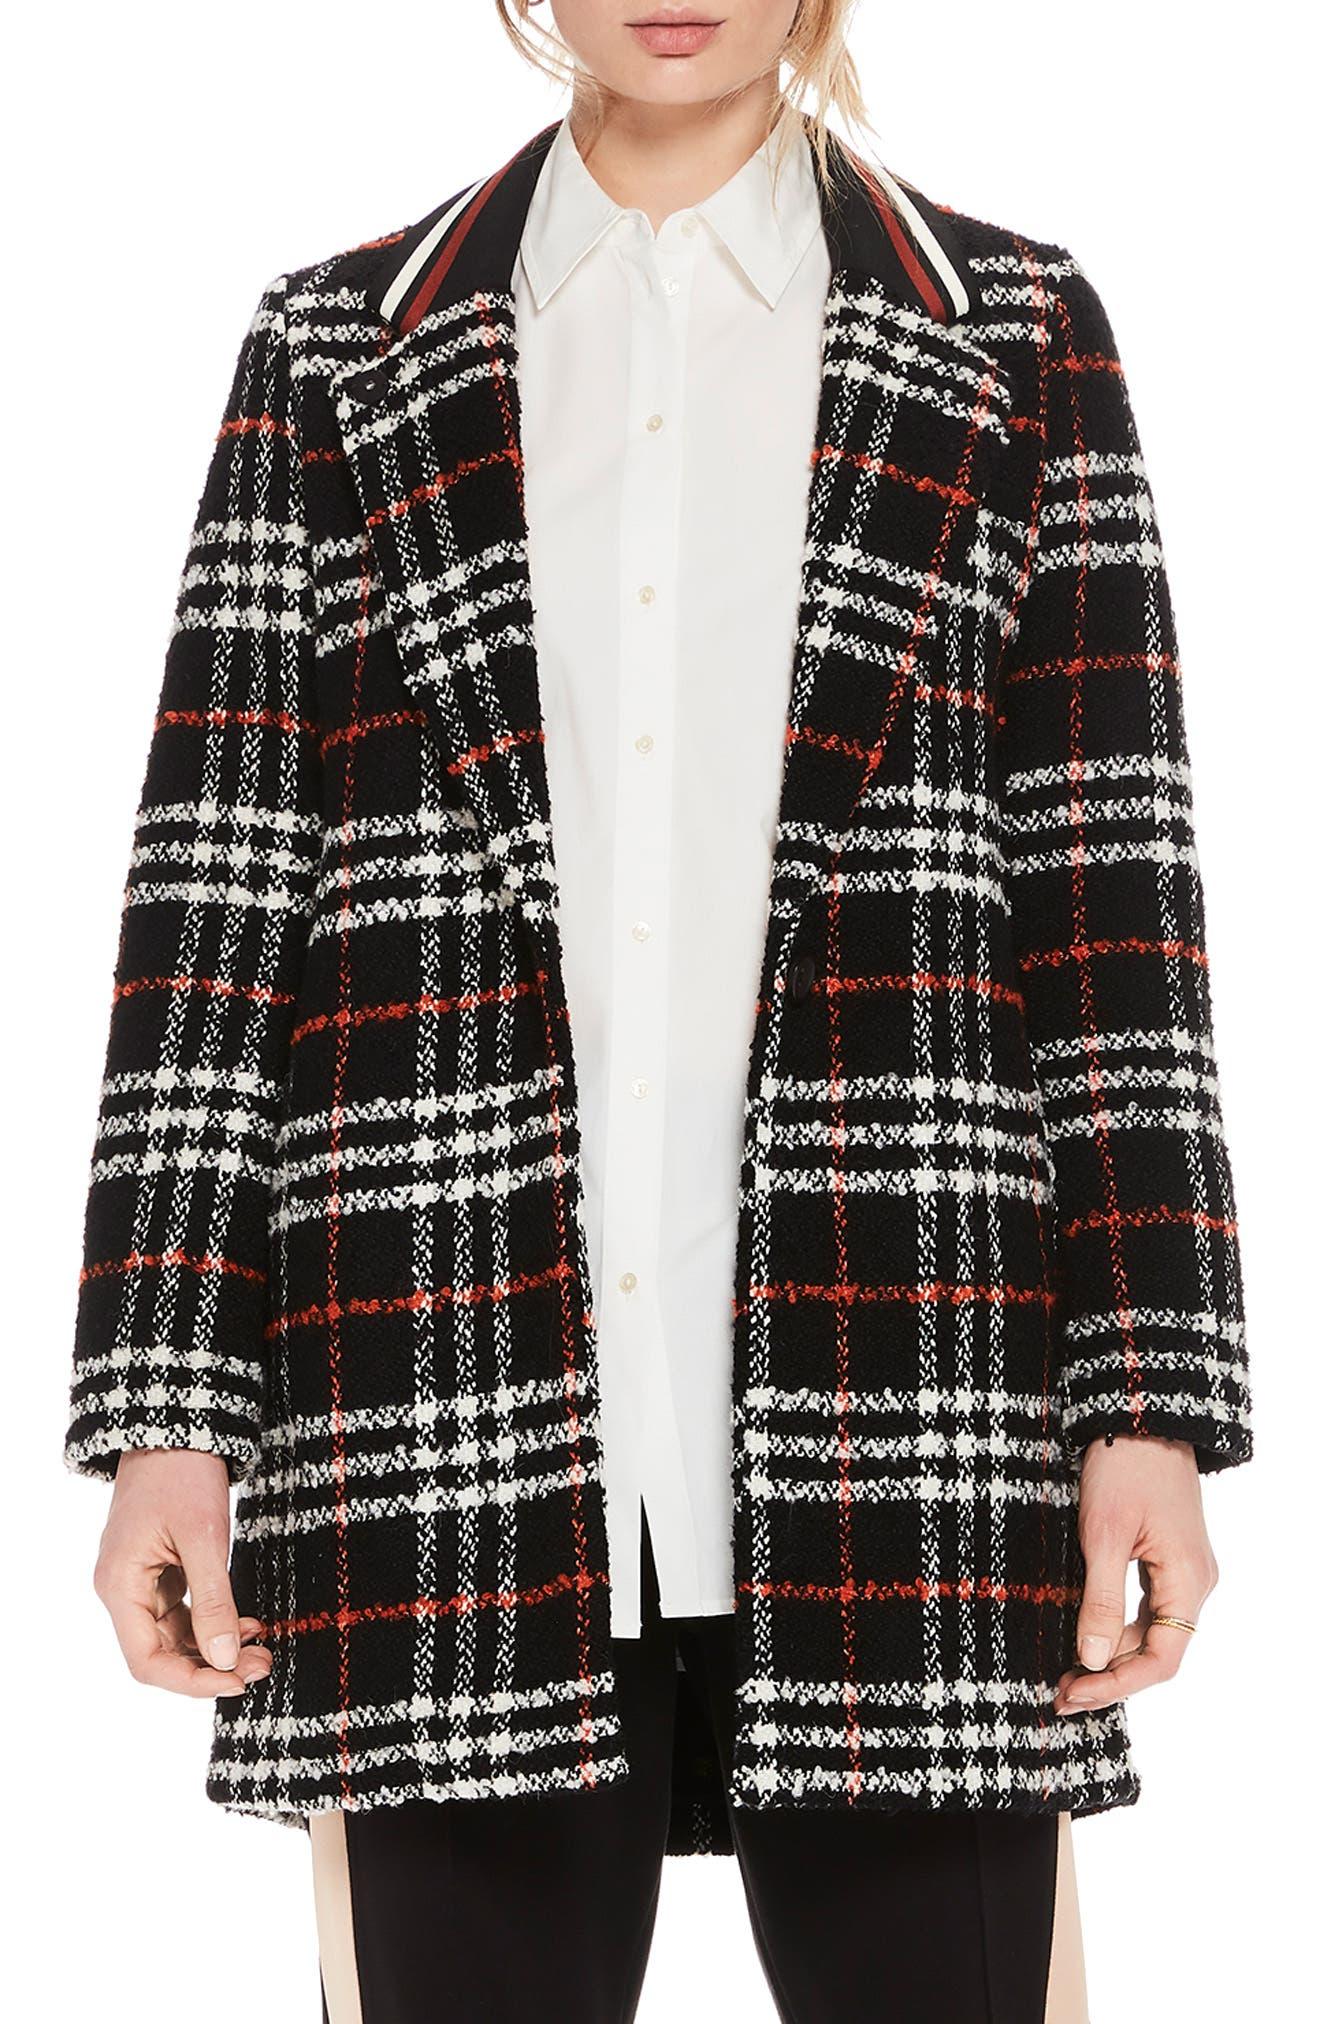 Bonded Wool Blend Jacket,                             Main thumbnail 1, color,                             001